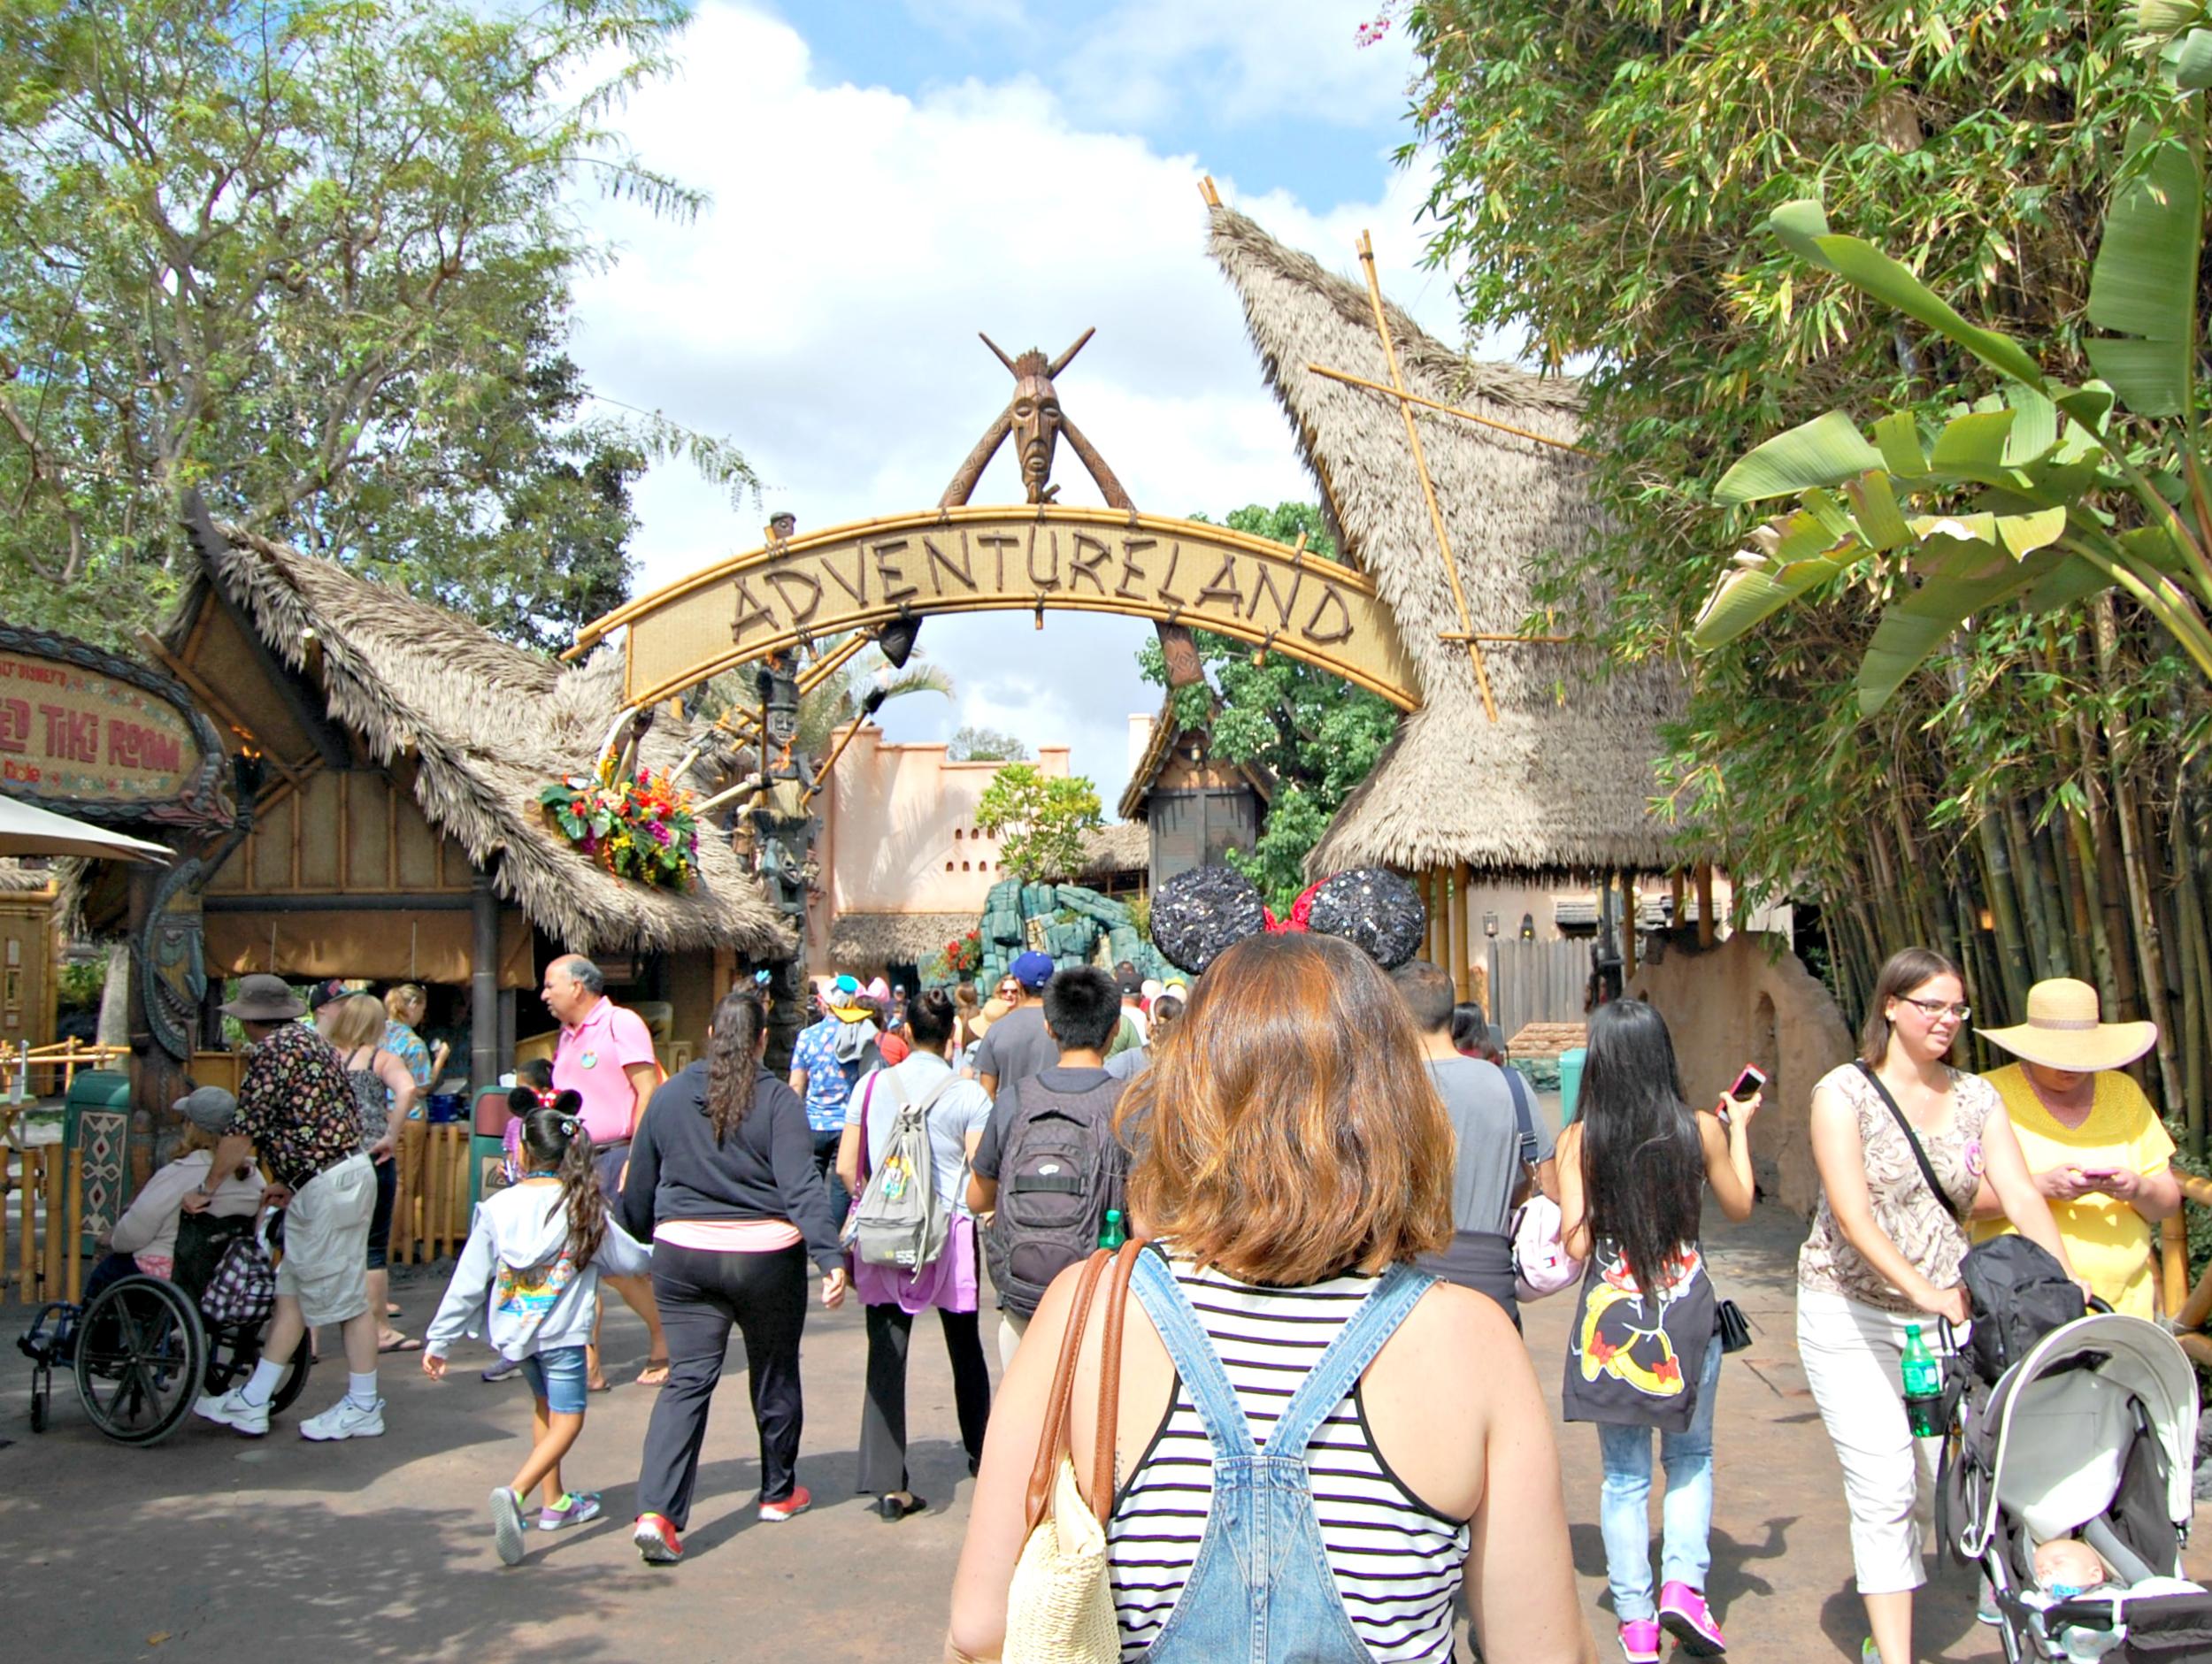 Disneyland Adventureland, California